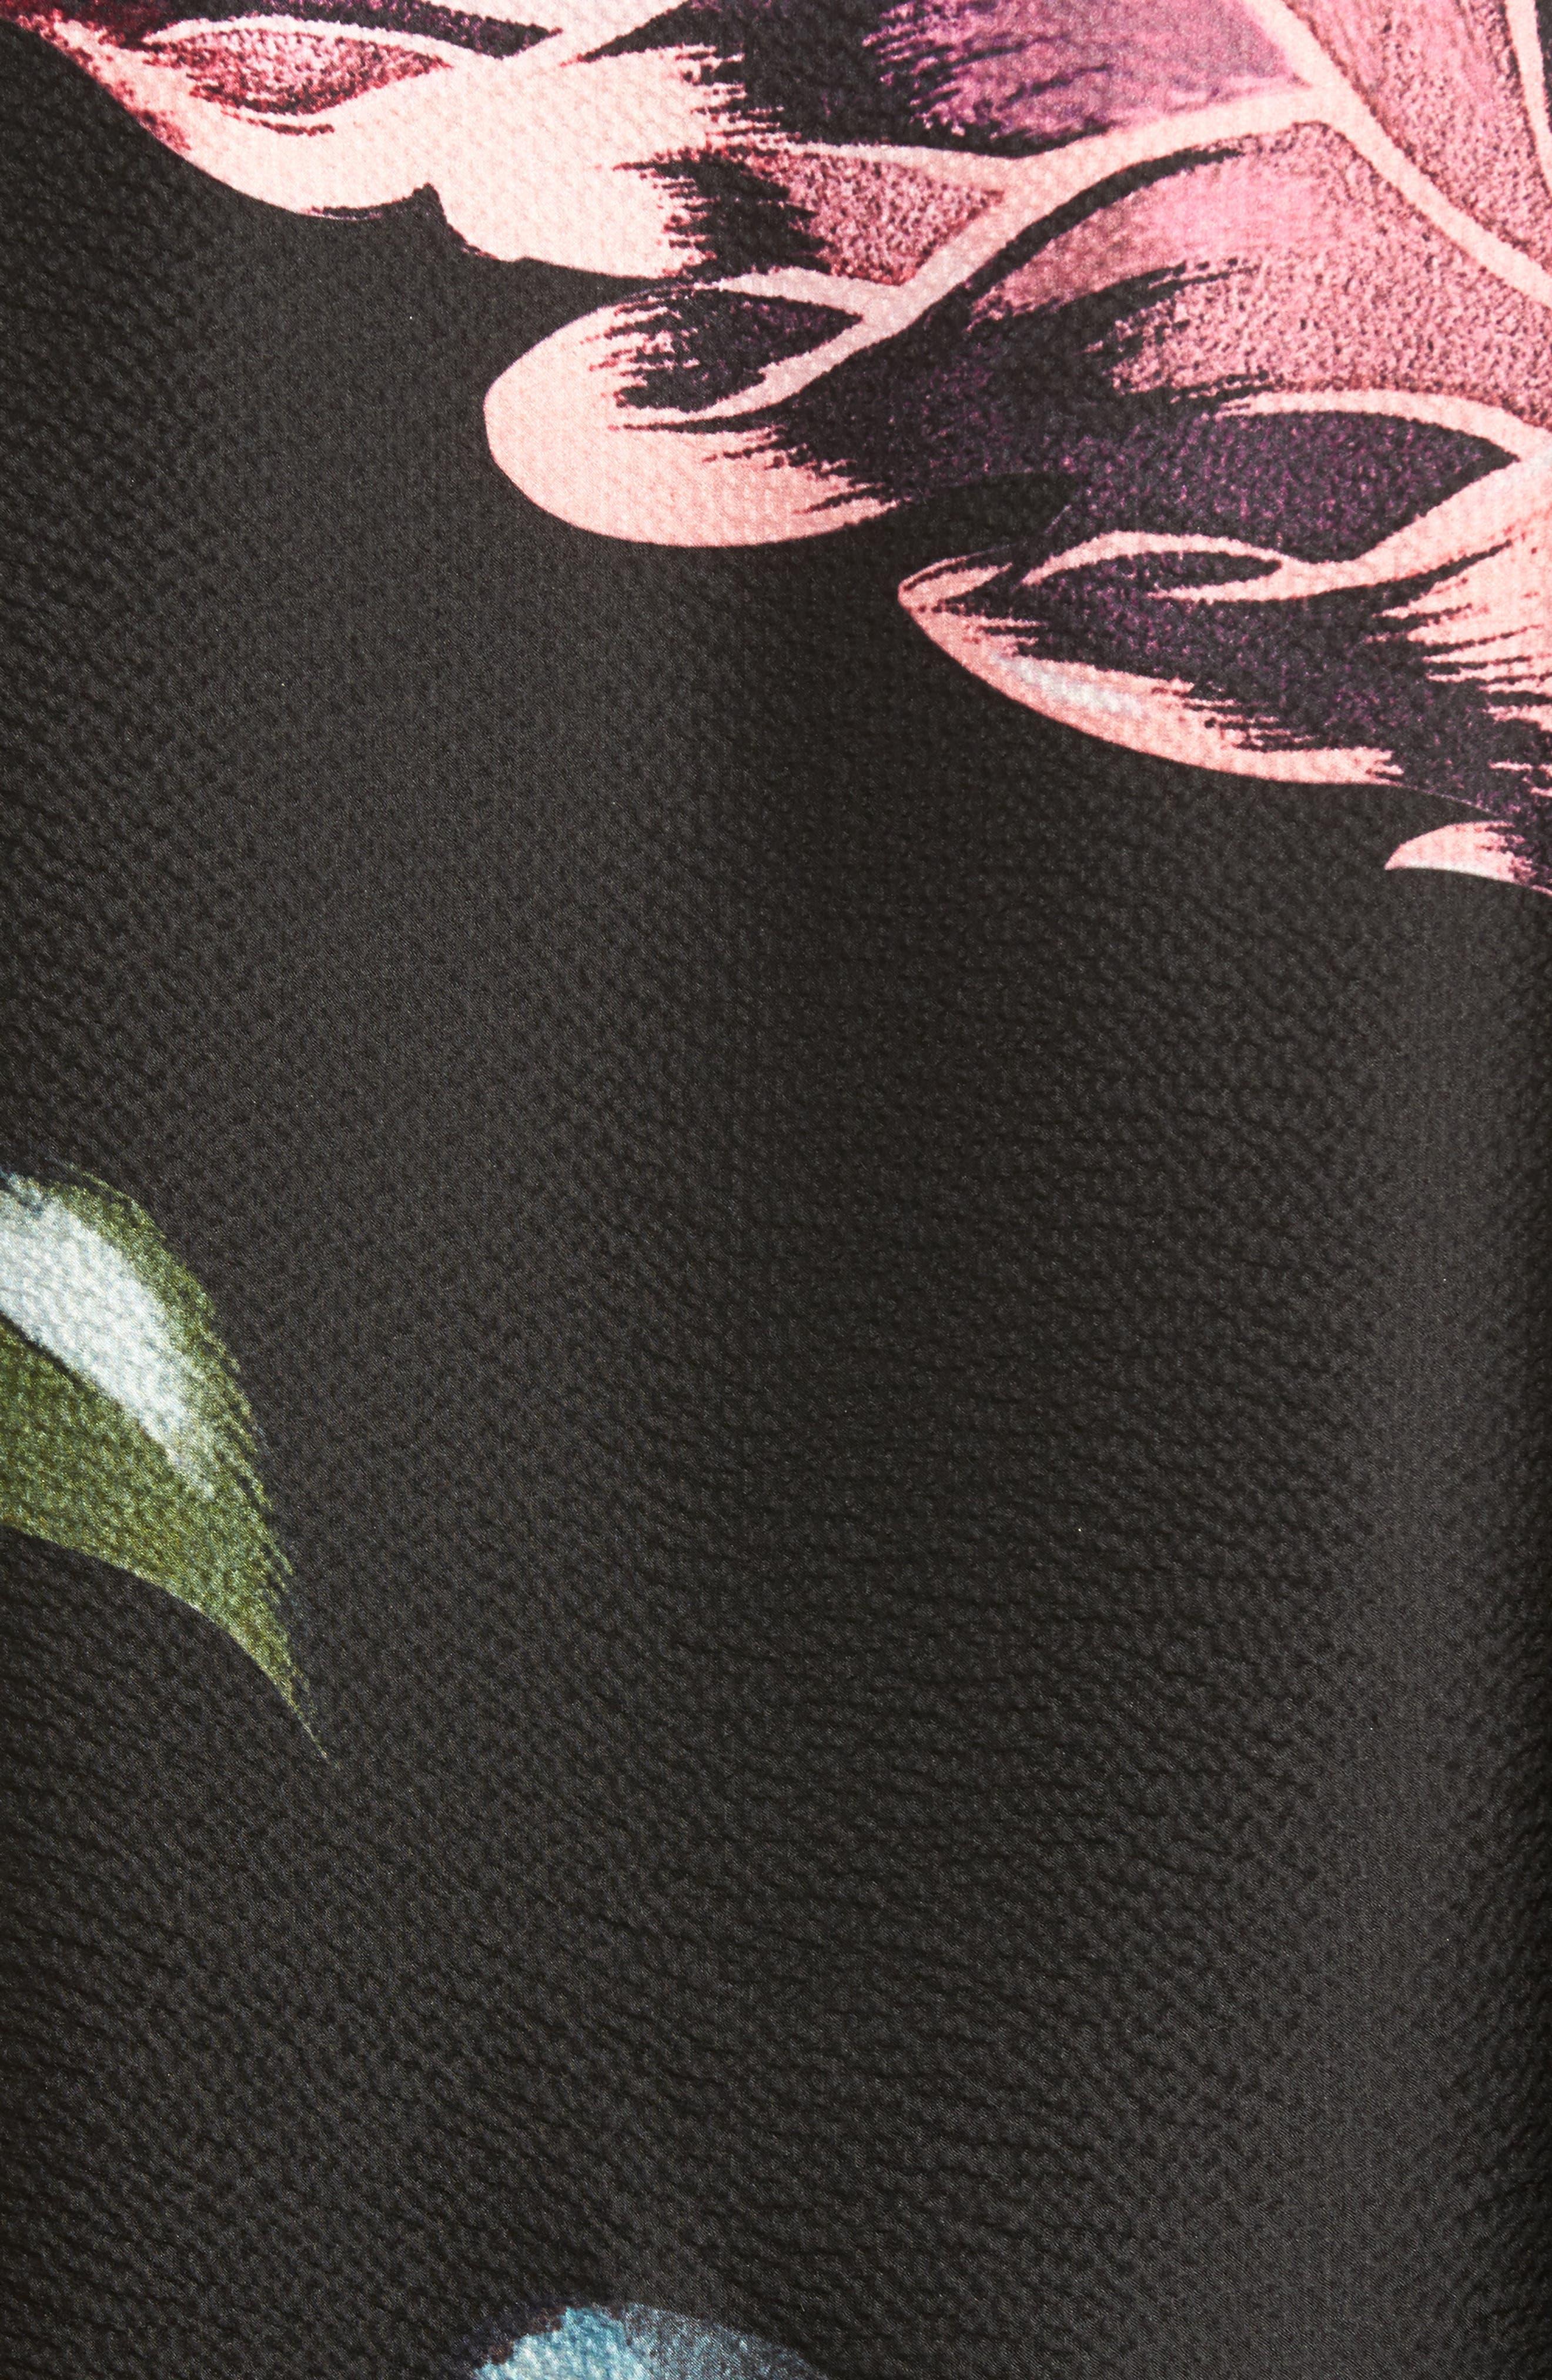 Eden Silk Cape Scarf,                             Alternate thumbnail 5, color,                             001